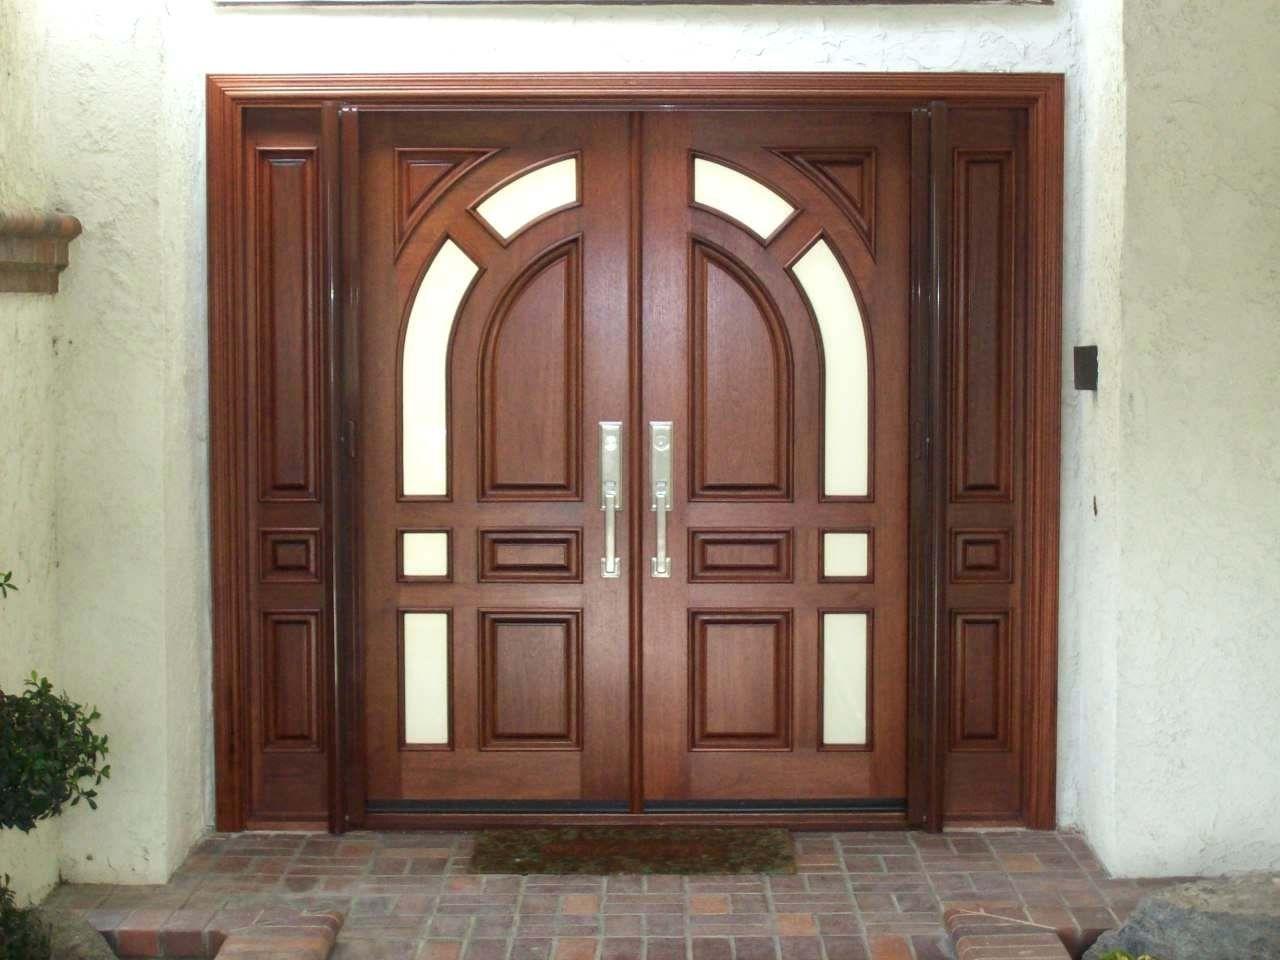 Mobile Home Exterior Doors 32 X 76 Httpthefallguyediting